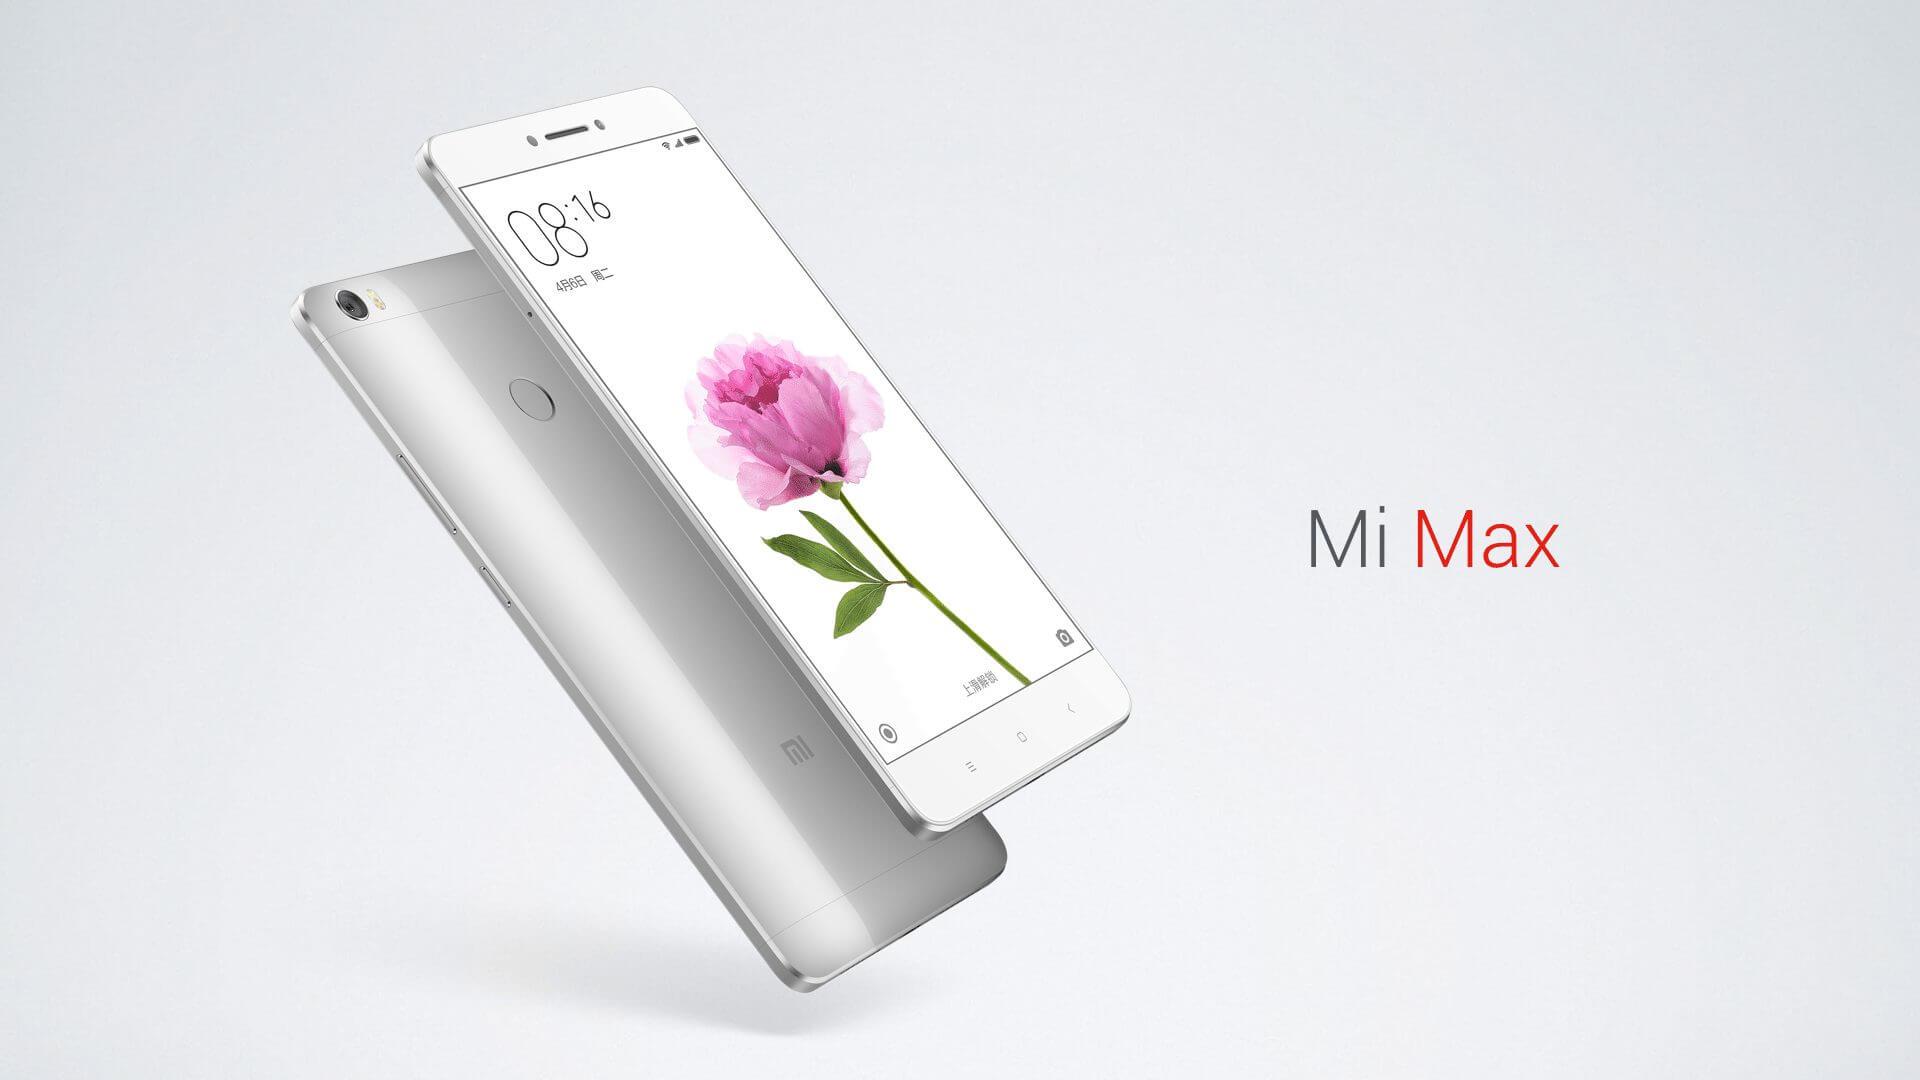 smt xiaomi gal03 - Xiaomi anuncia o Mi Max e revela o MIUI 8